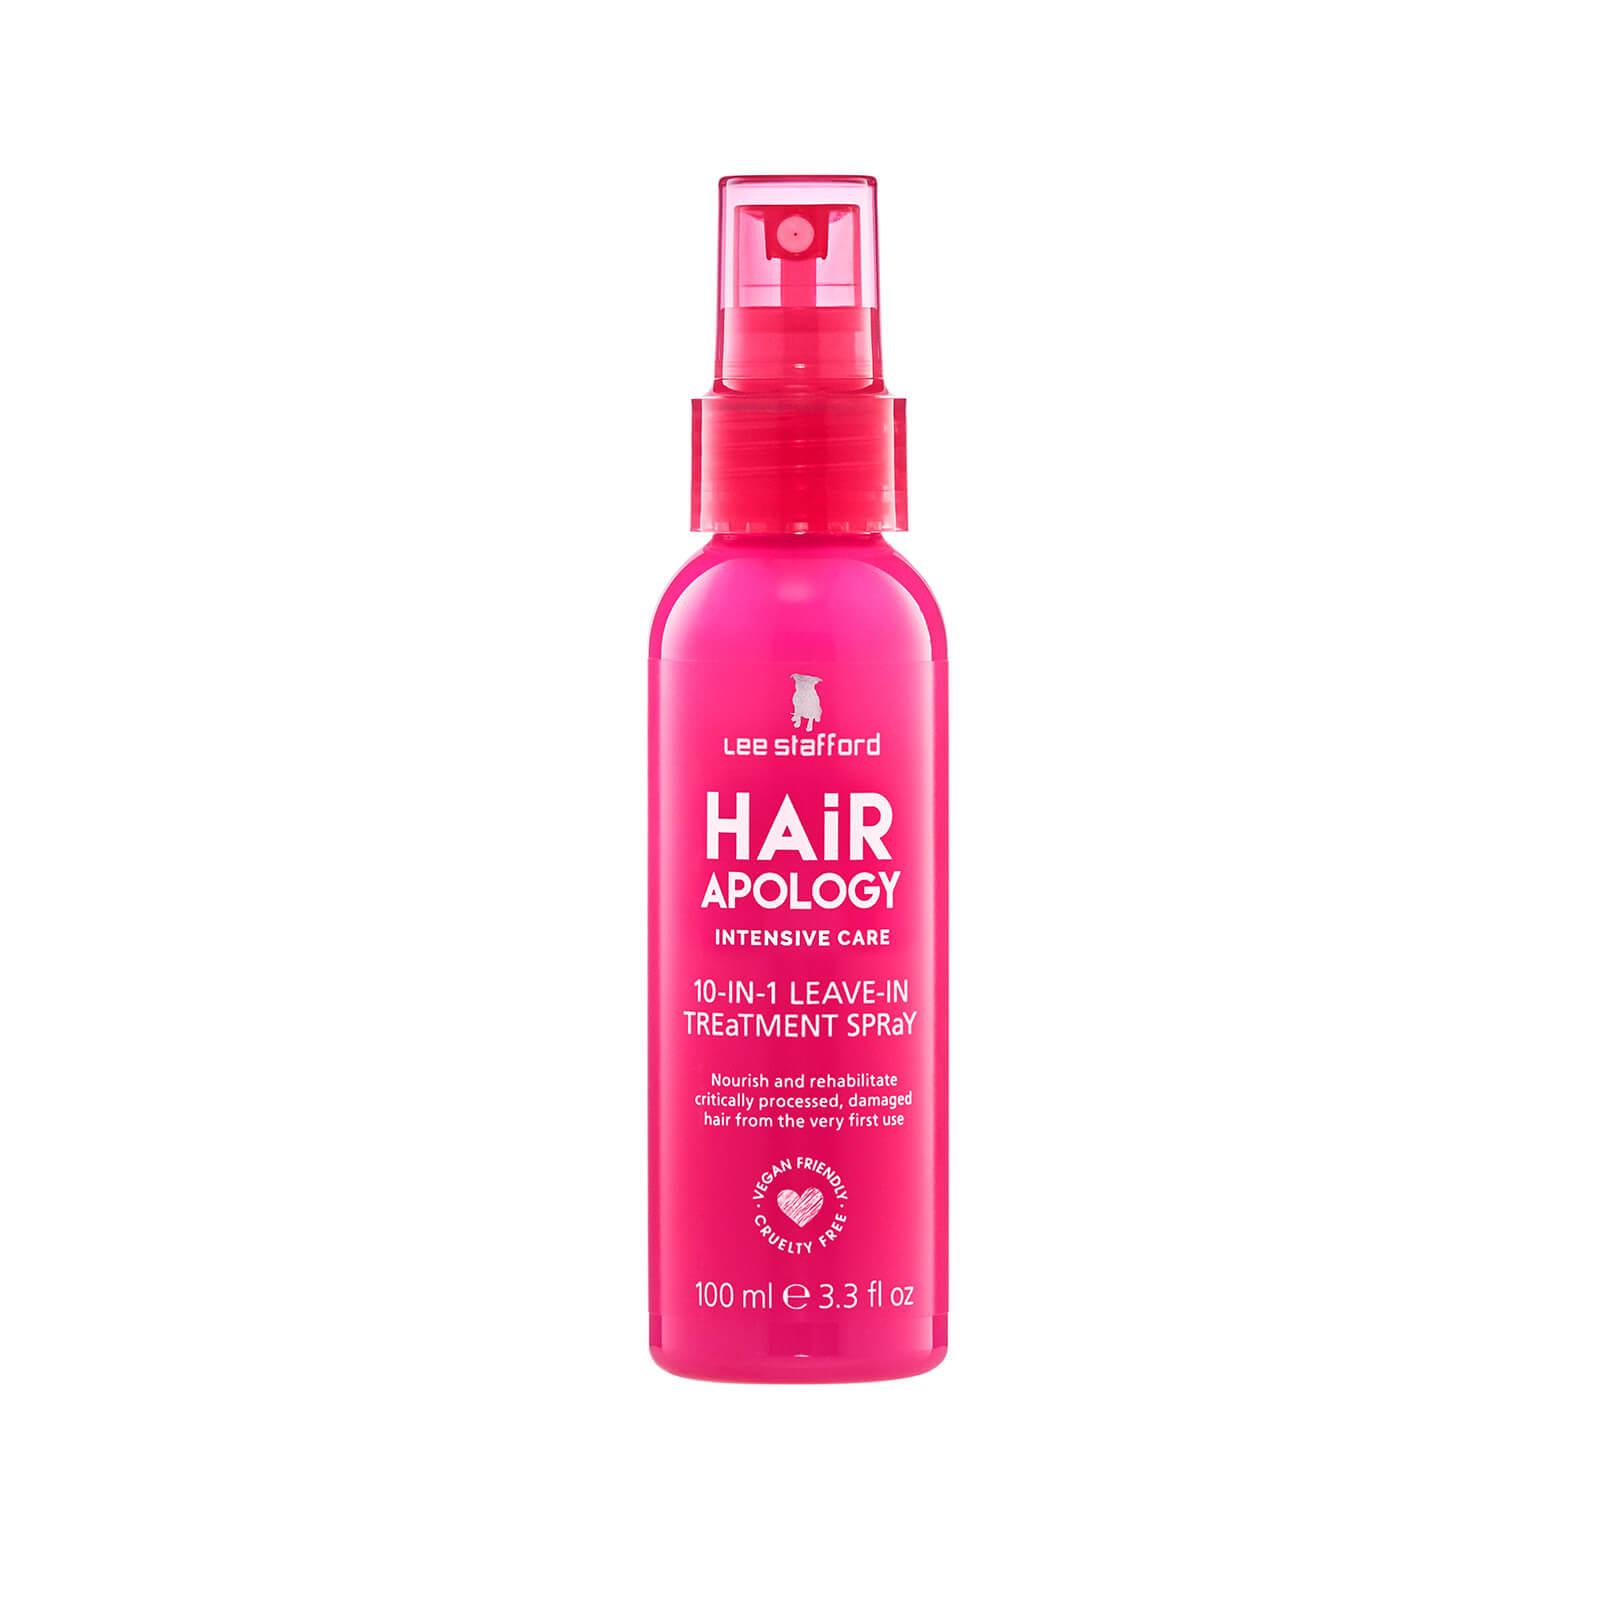 Купить Lee Stafford Hair Apology 10 in 1 Leave In Treatment Spray 100ml